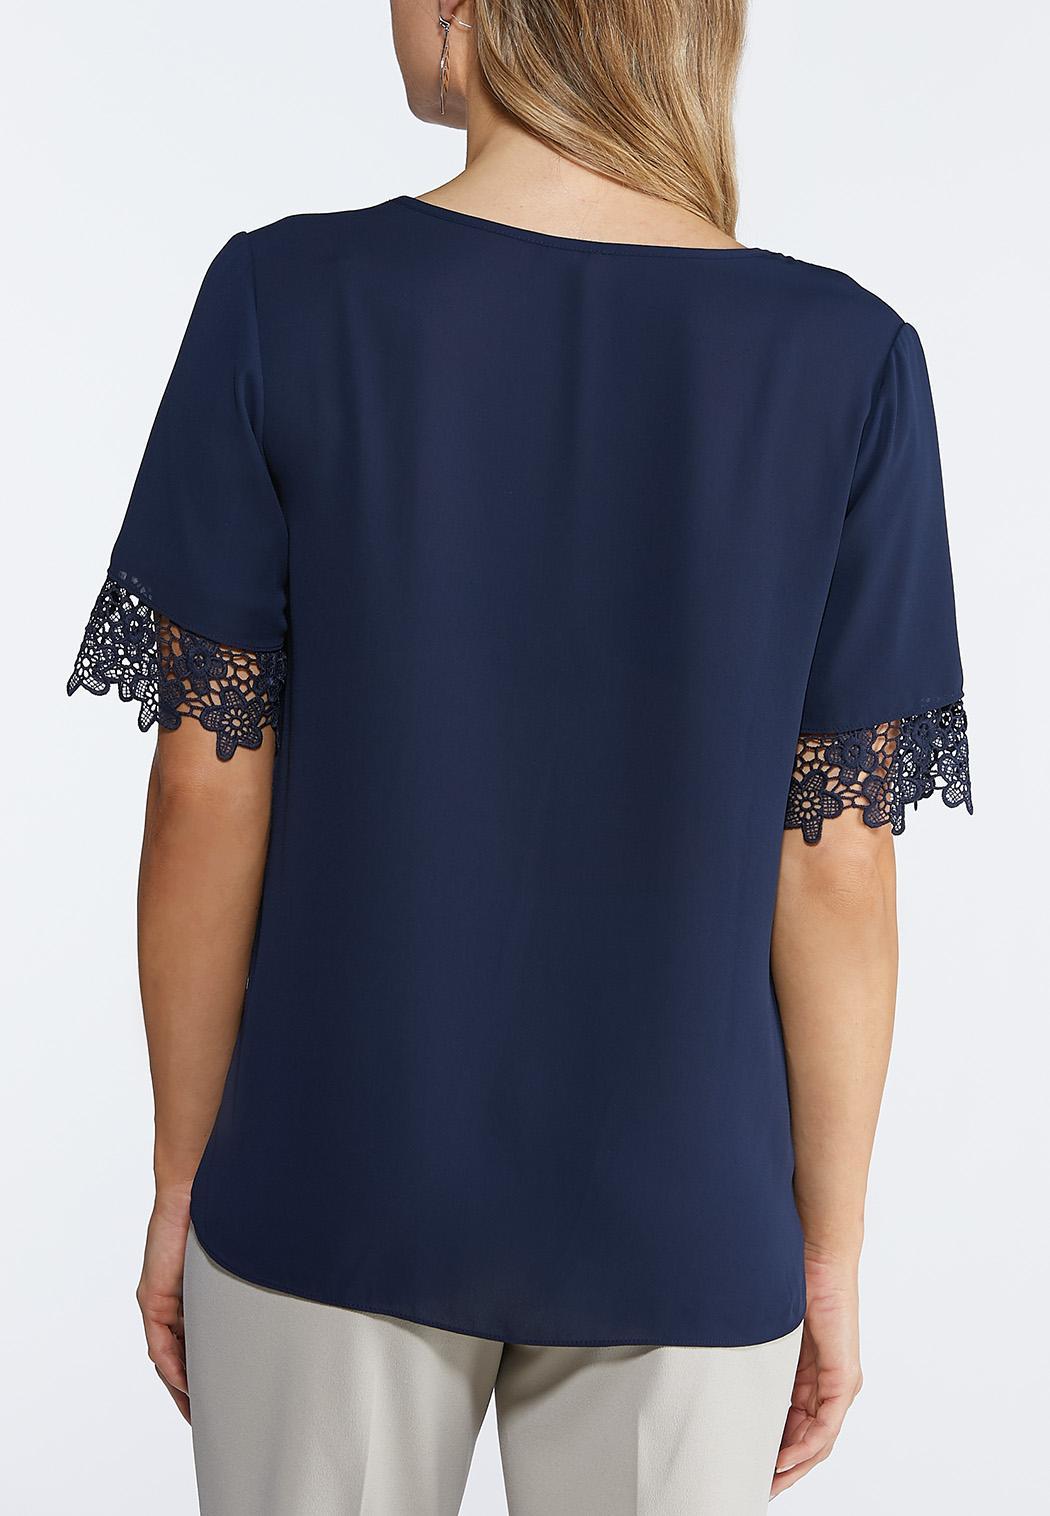 Lace Trim Woven Top (Item #43945806)